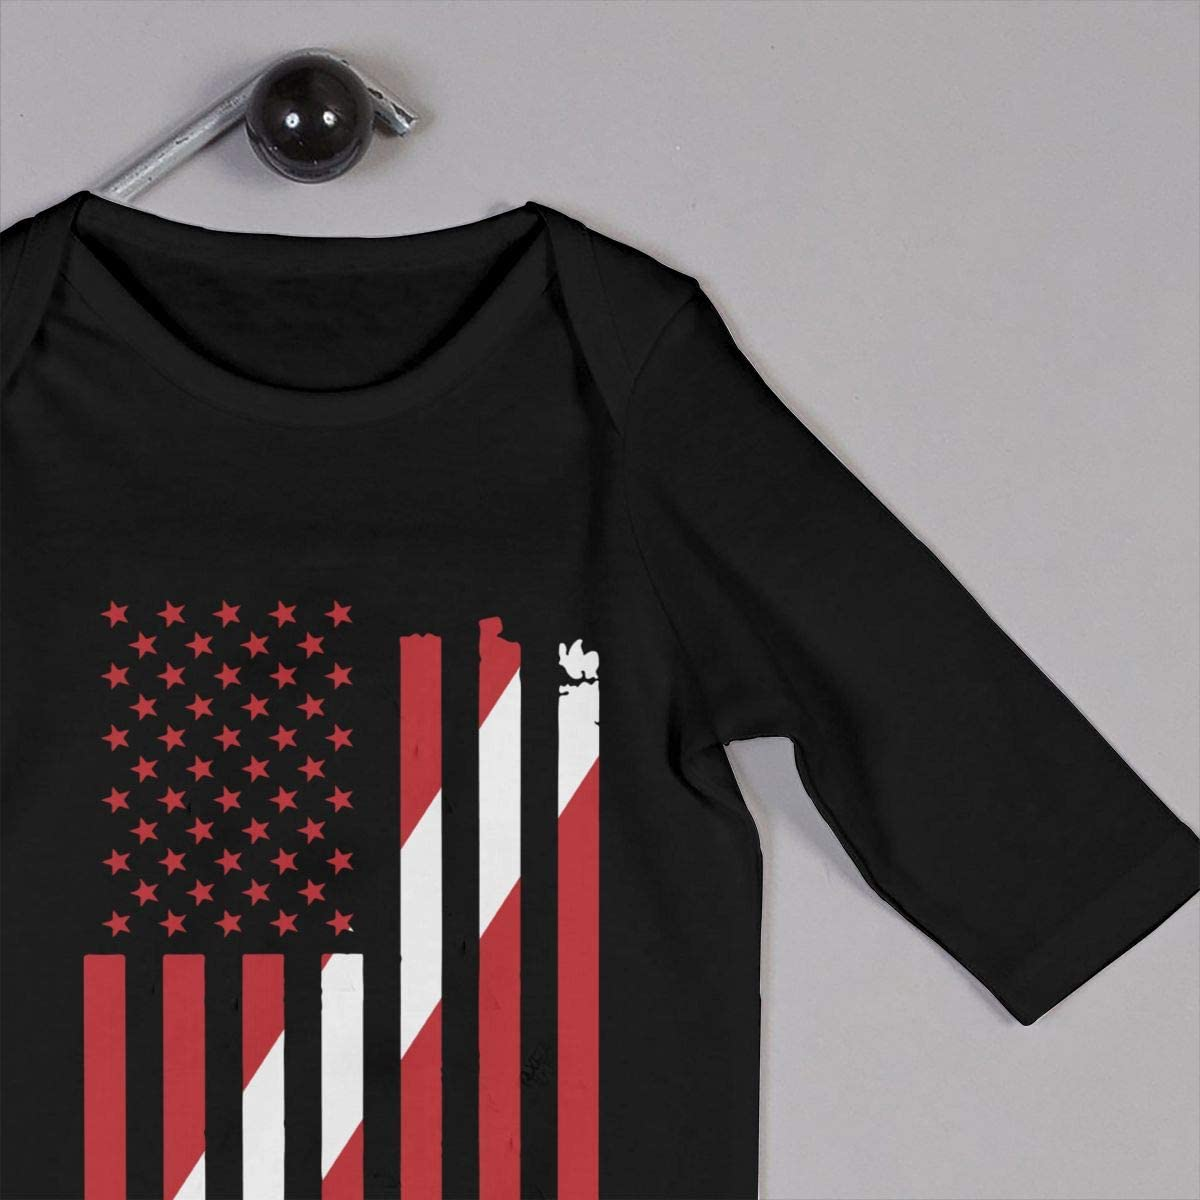 YELTY6F American Dive Flag Printed Newborn Baby Boy Girl Jumpsuit Long Sleeve Romper Black